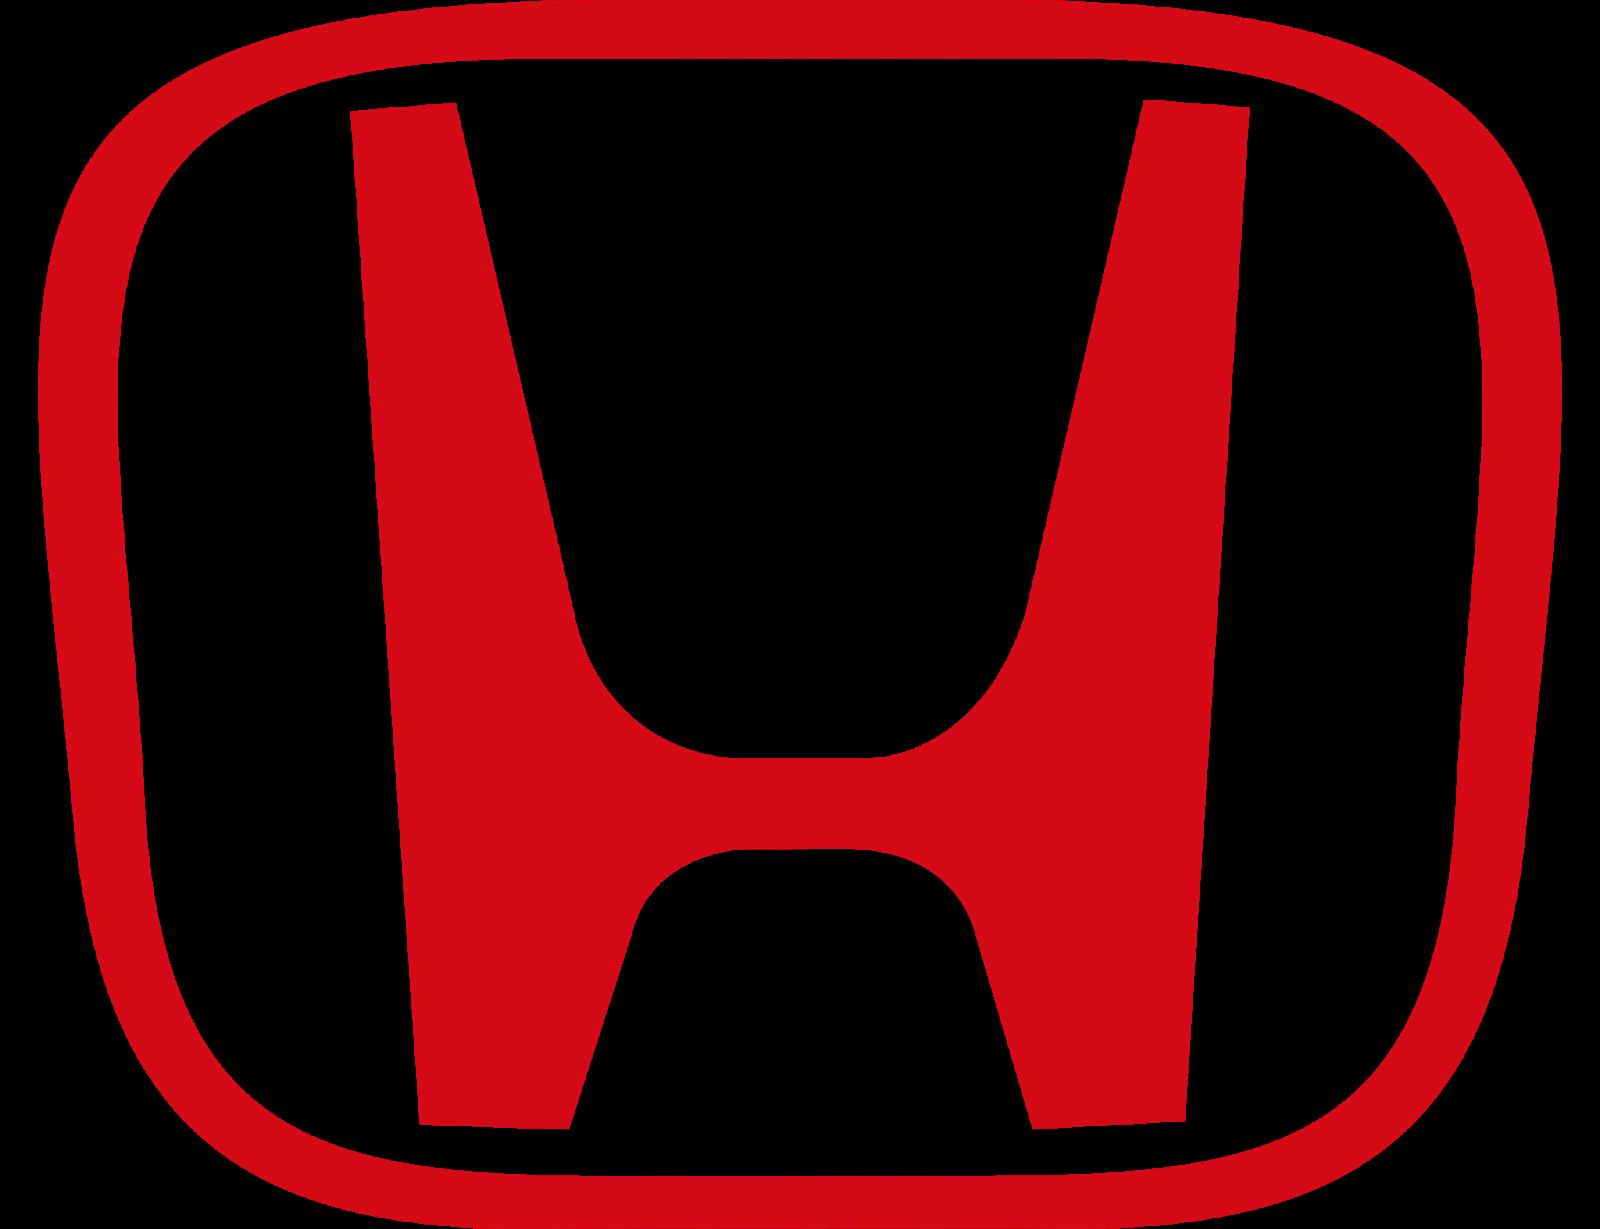 Pubg Hd Png Background: Honda Logo Transparent PNG Pictures